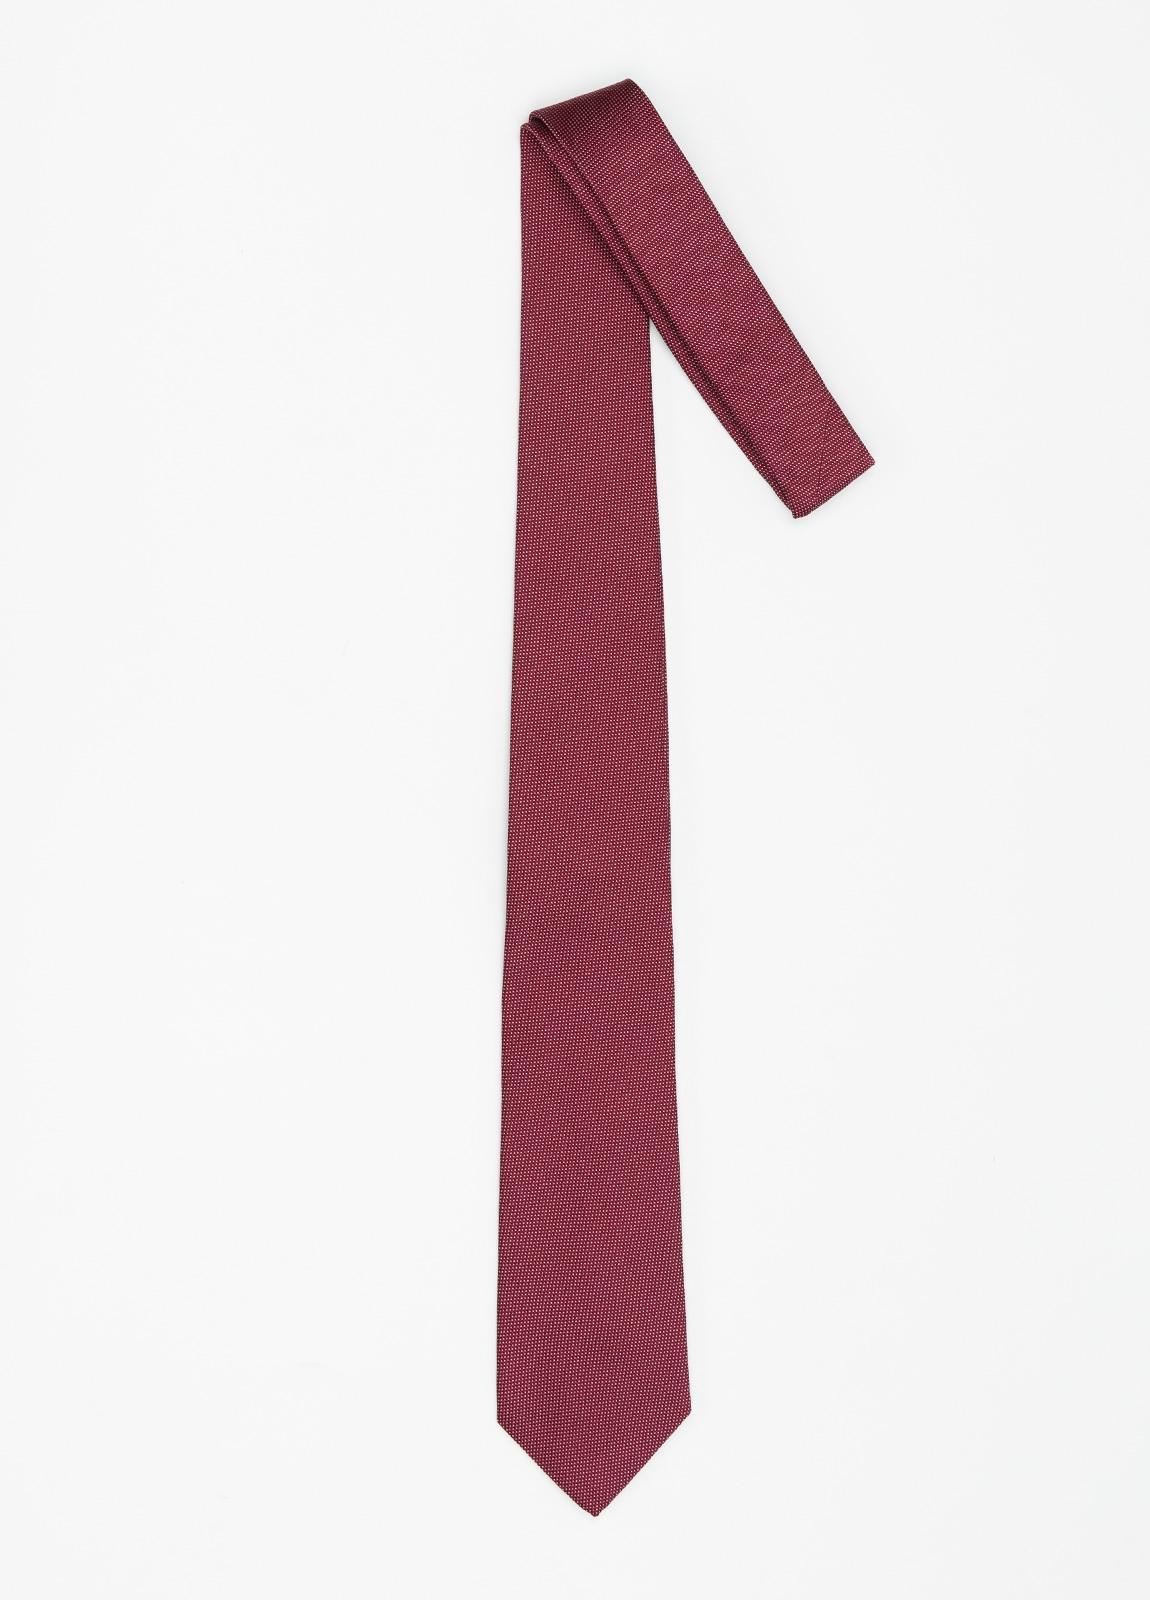 Corbata formal wear micro textura, color granate pala 7,5 CM 100% Seda. - Ítem1